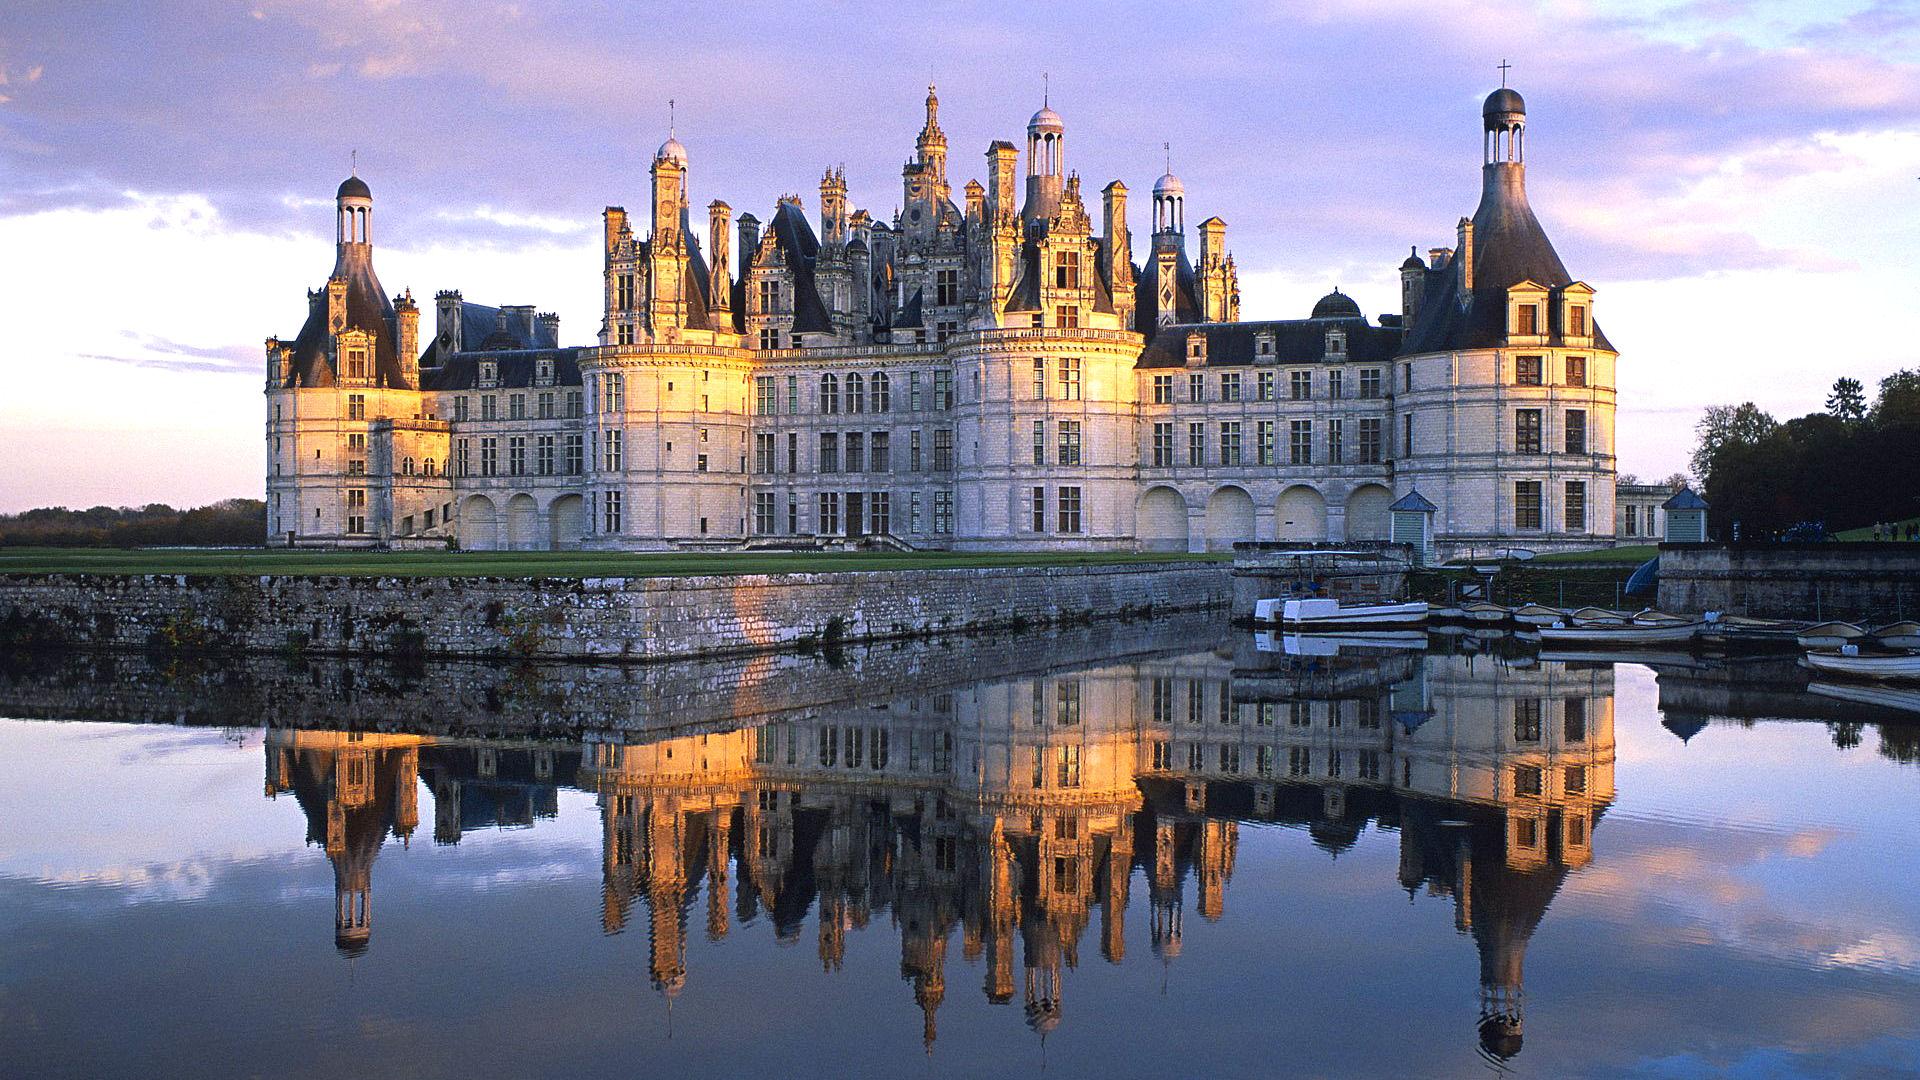 Chateau_of_chambord_1920x1080.jpg